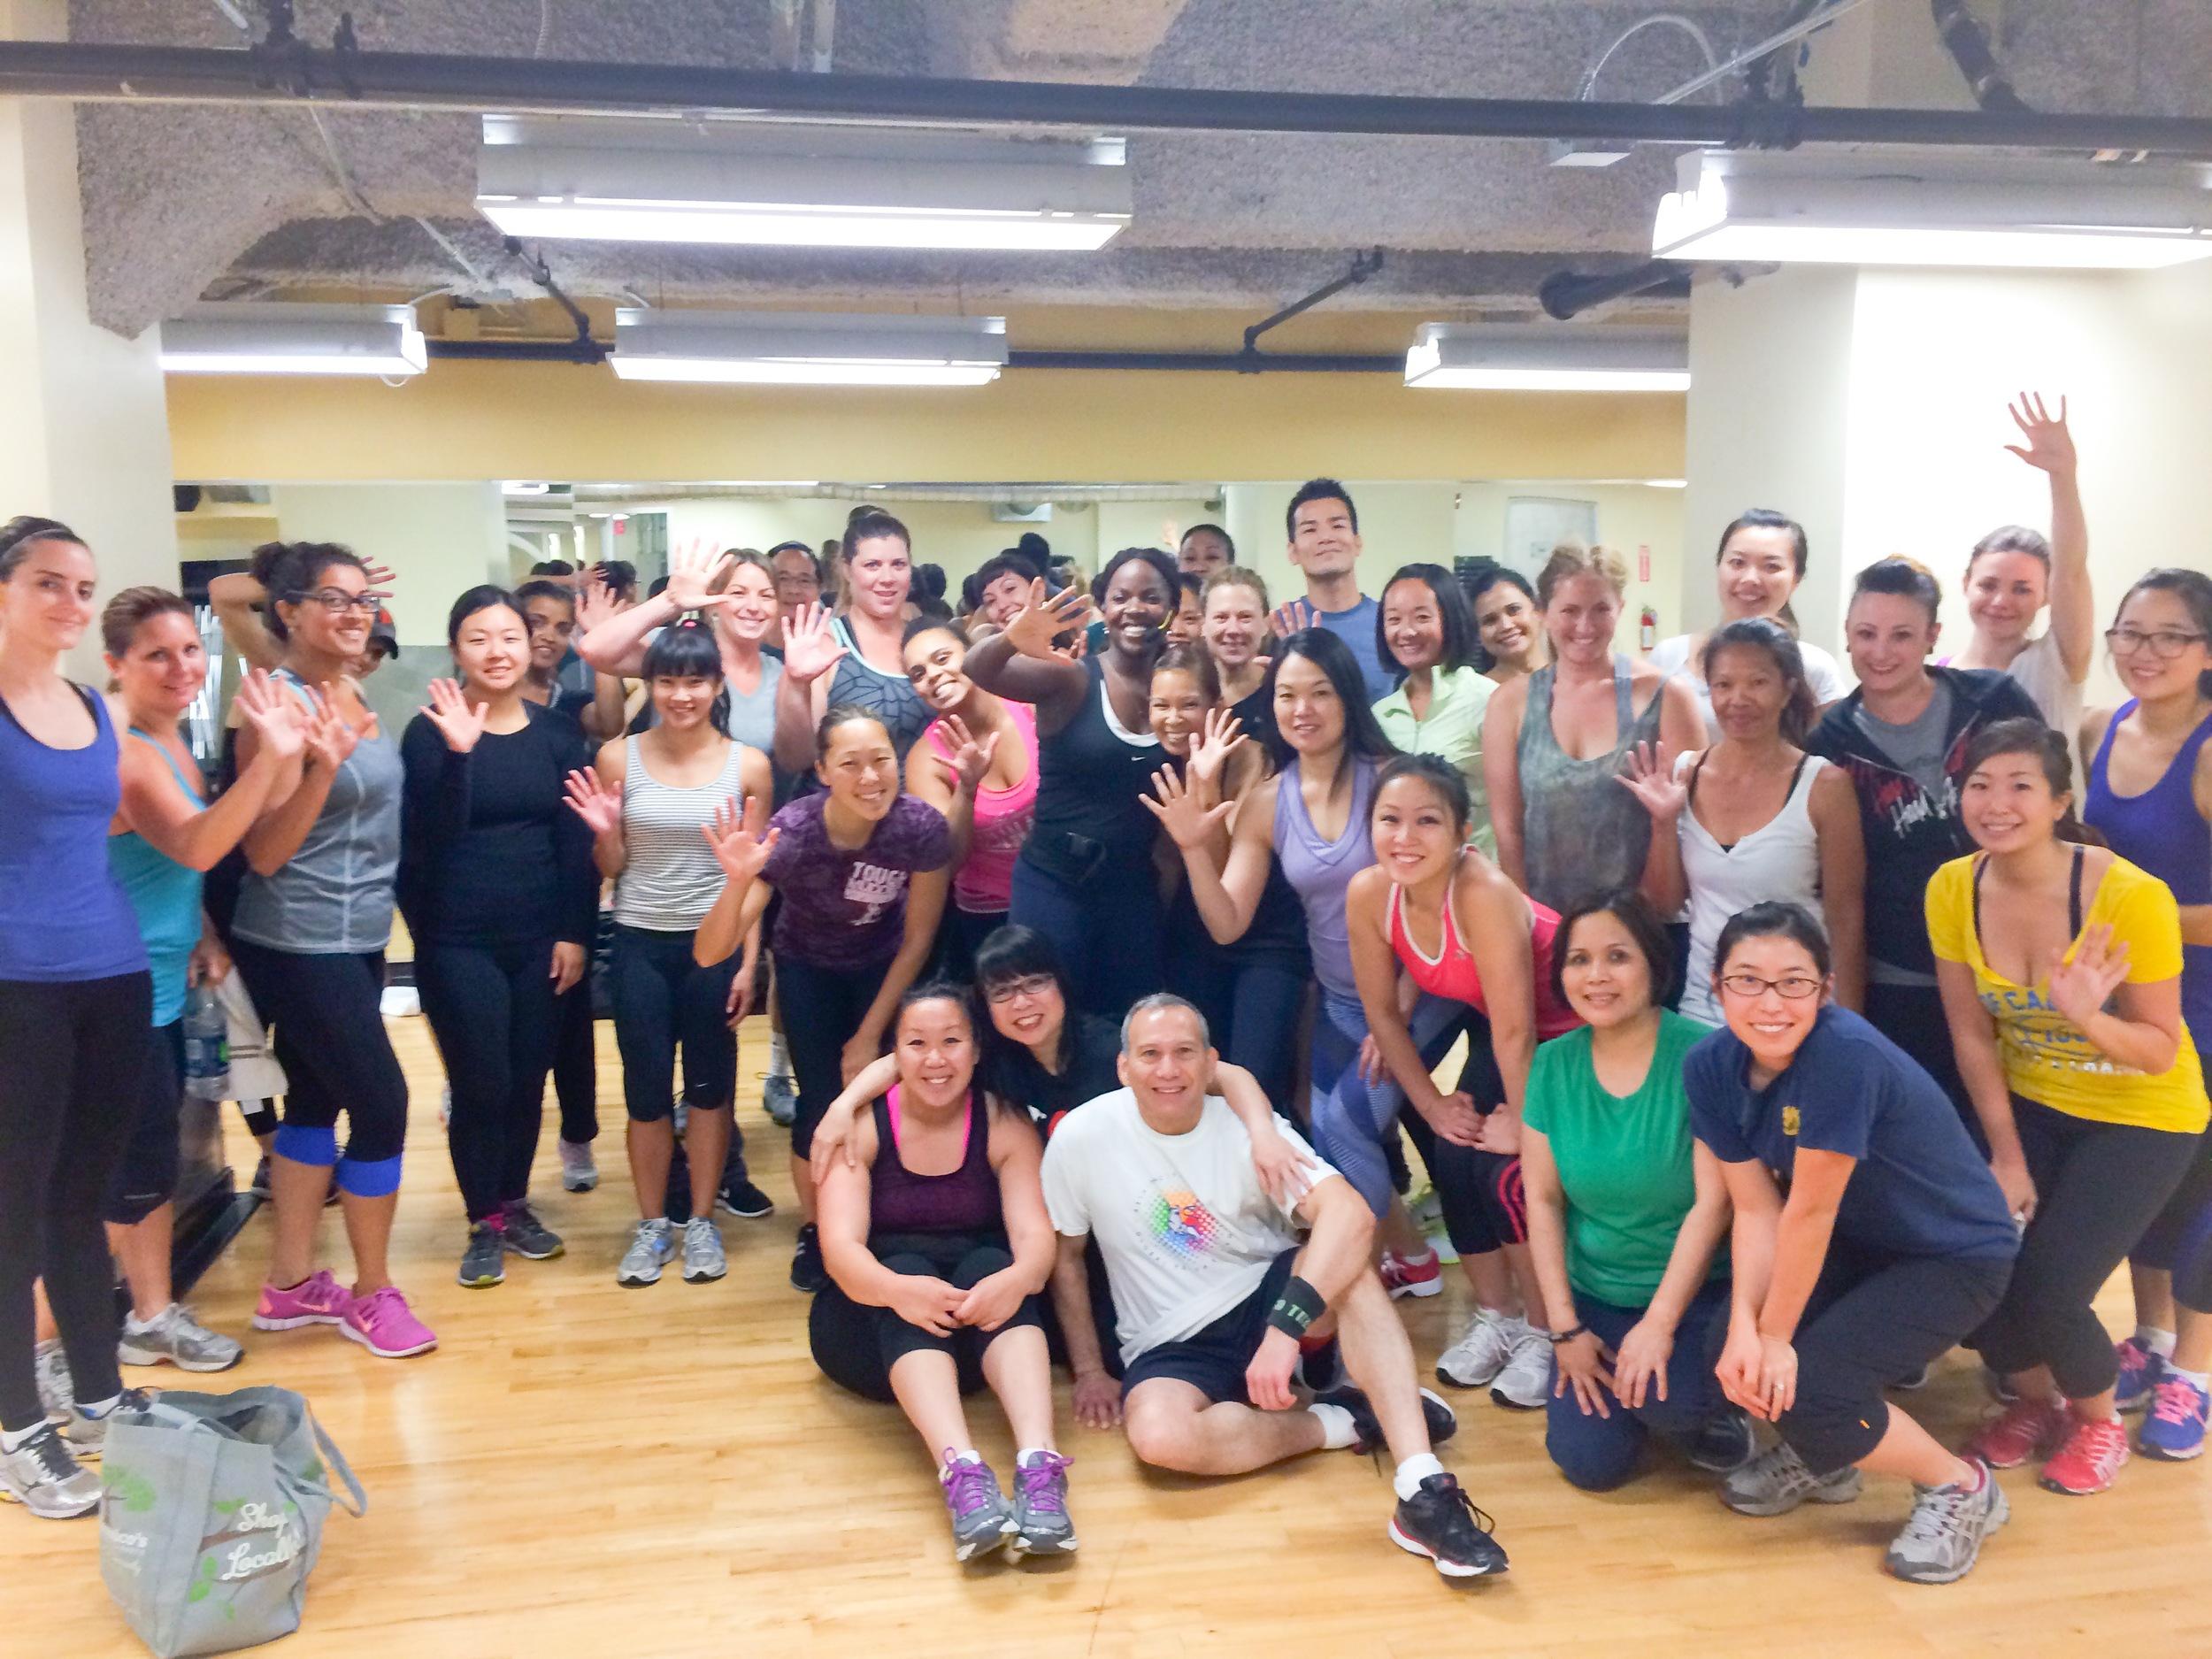 Celebrating 5 years with my San Francisco Turbo Kick Crew (July 2014)